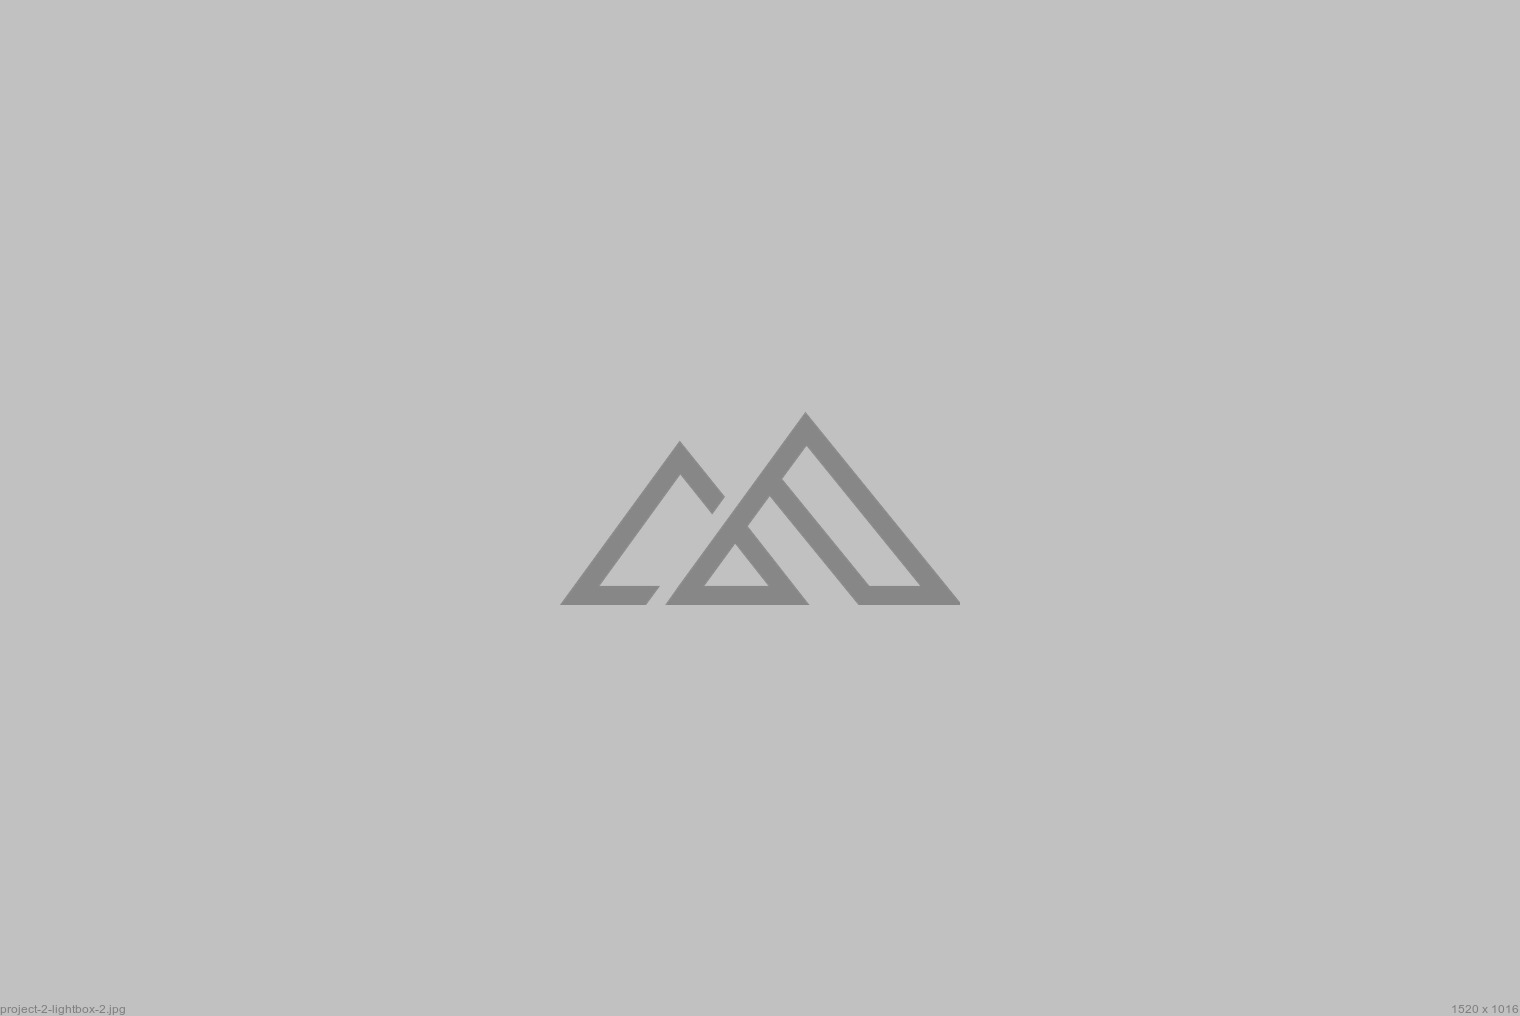 project-2-lightbox